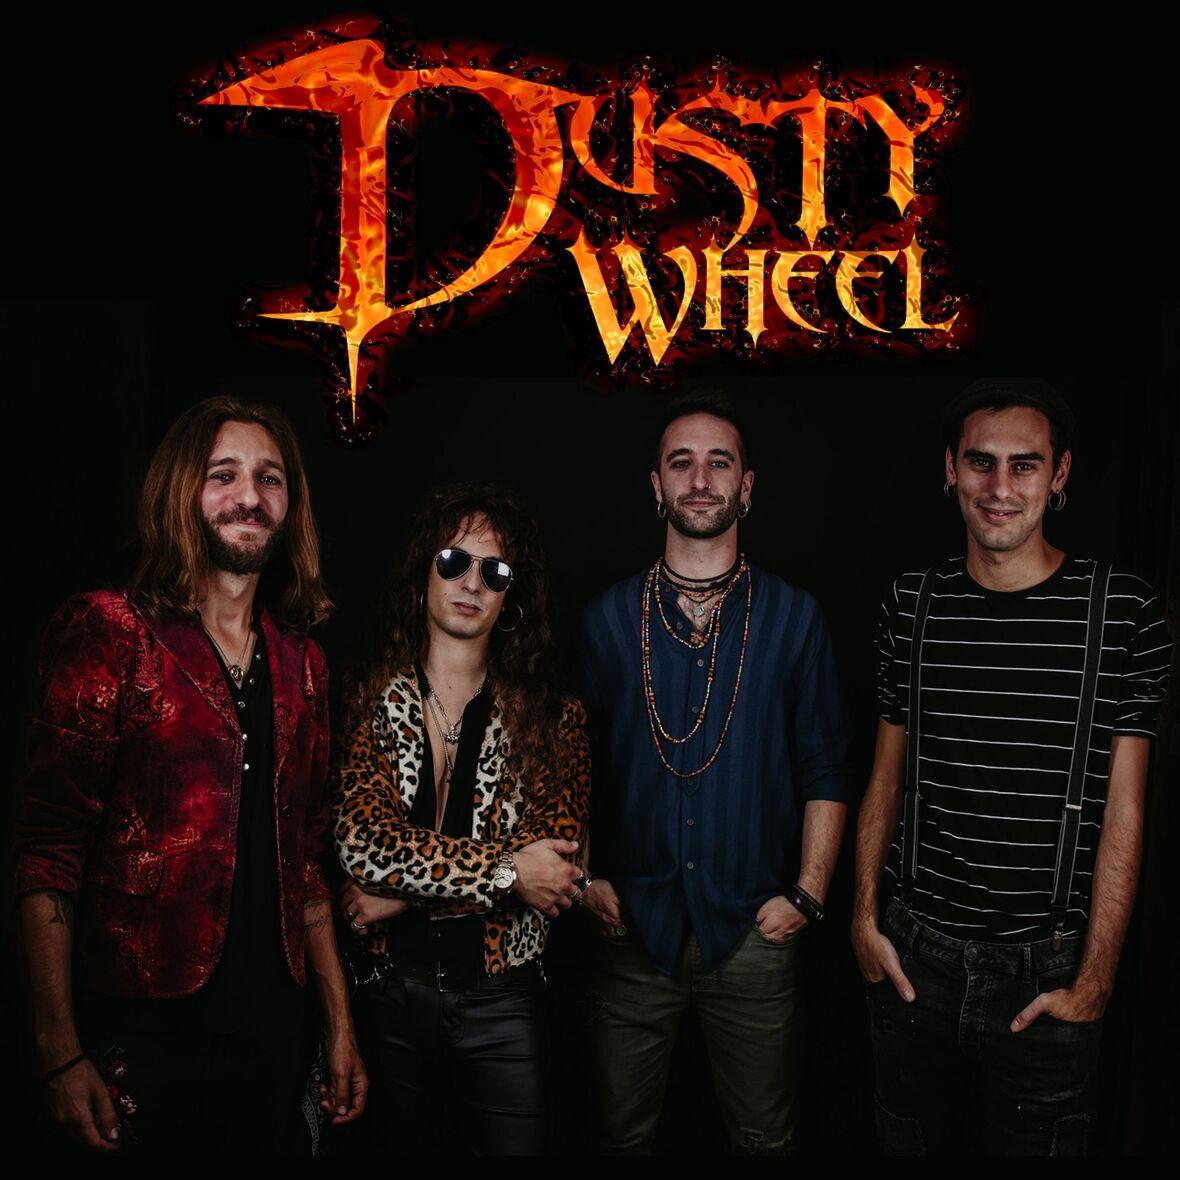 DustyWheelfotonombre1